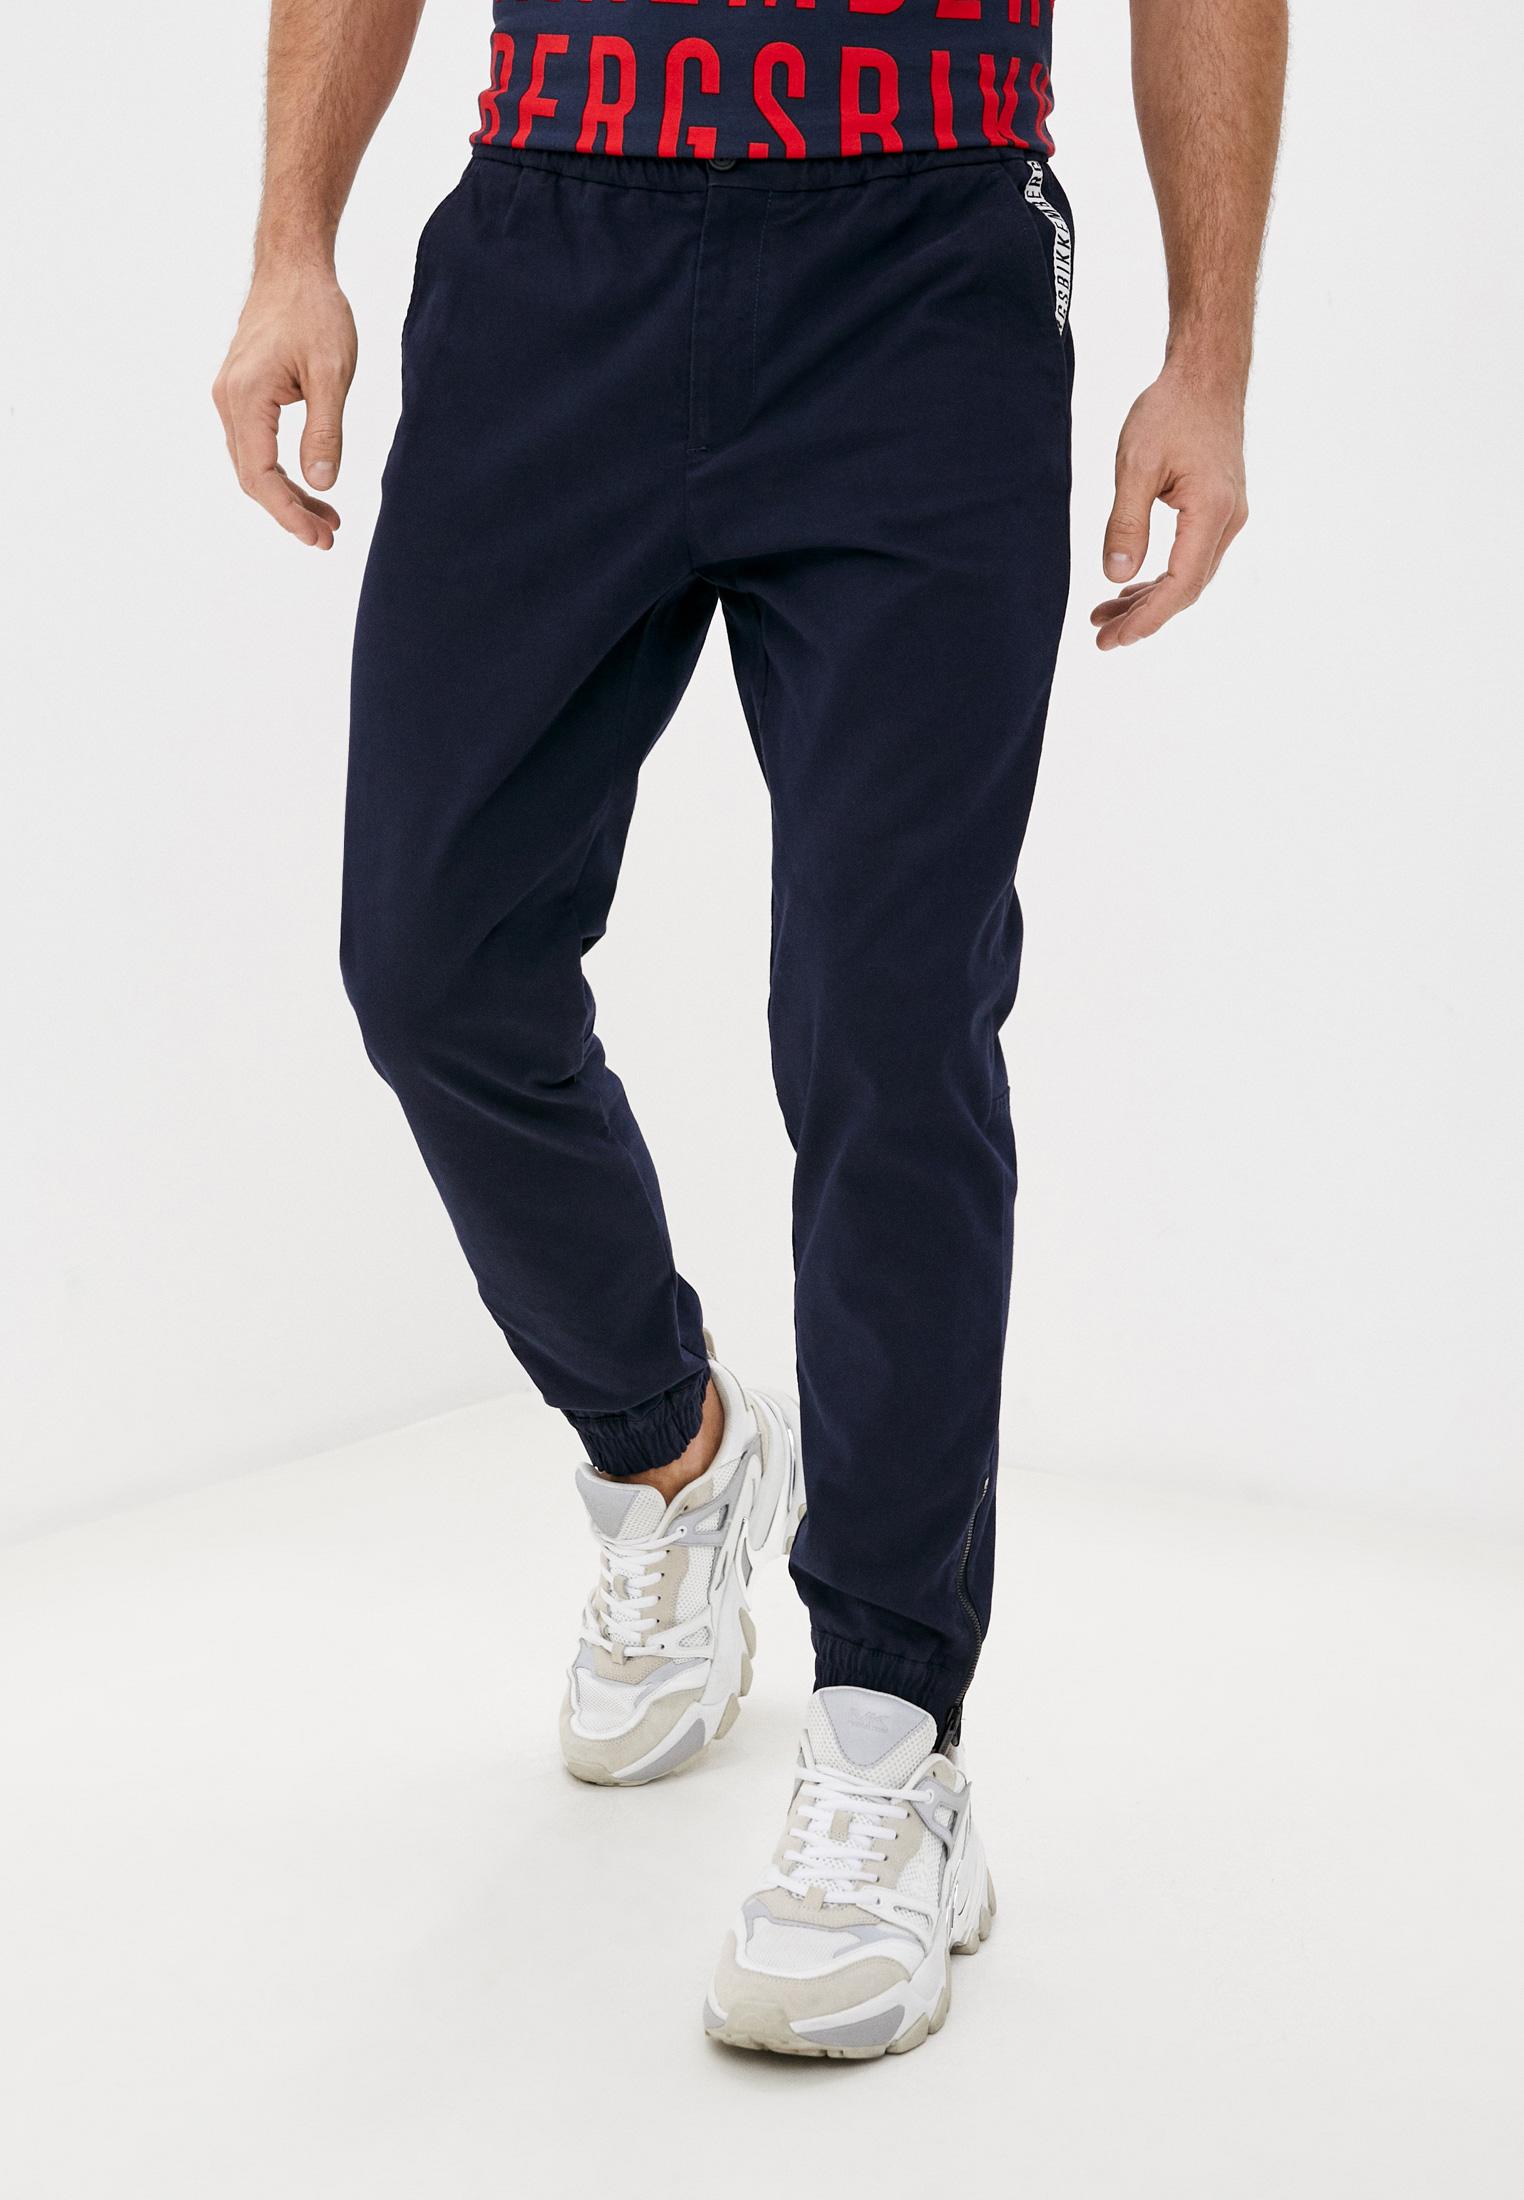 Мужские повседневные брюки Bikkembergs (Биккембергс) C P 039 00 S 3330